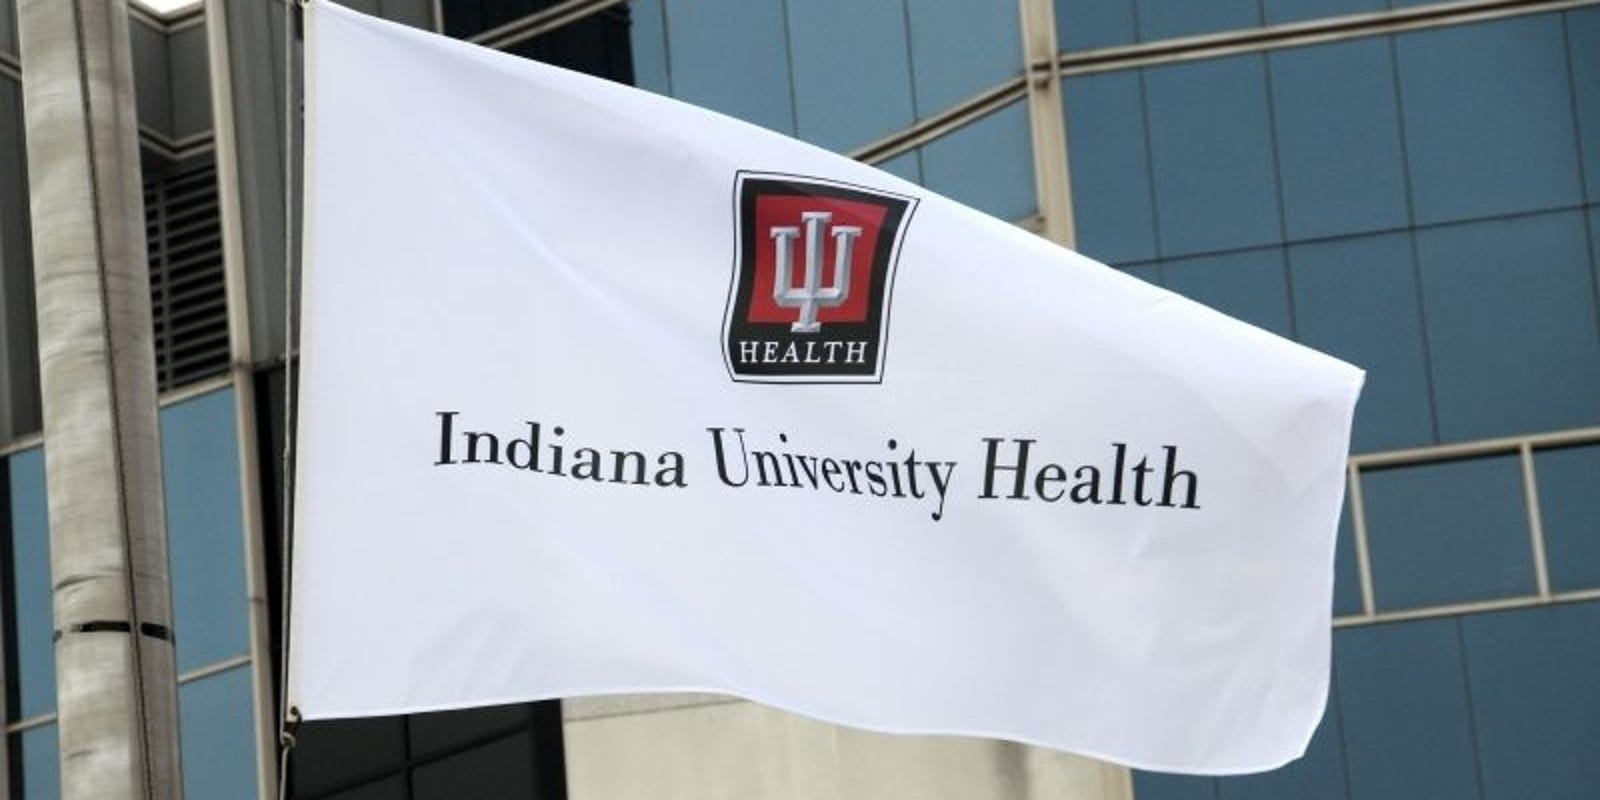 IU Health: Nurse \'no longer an employee\'.